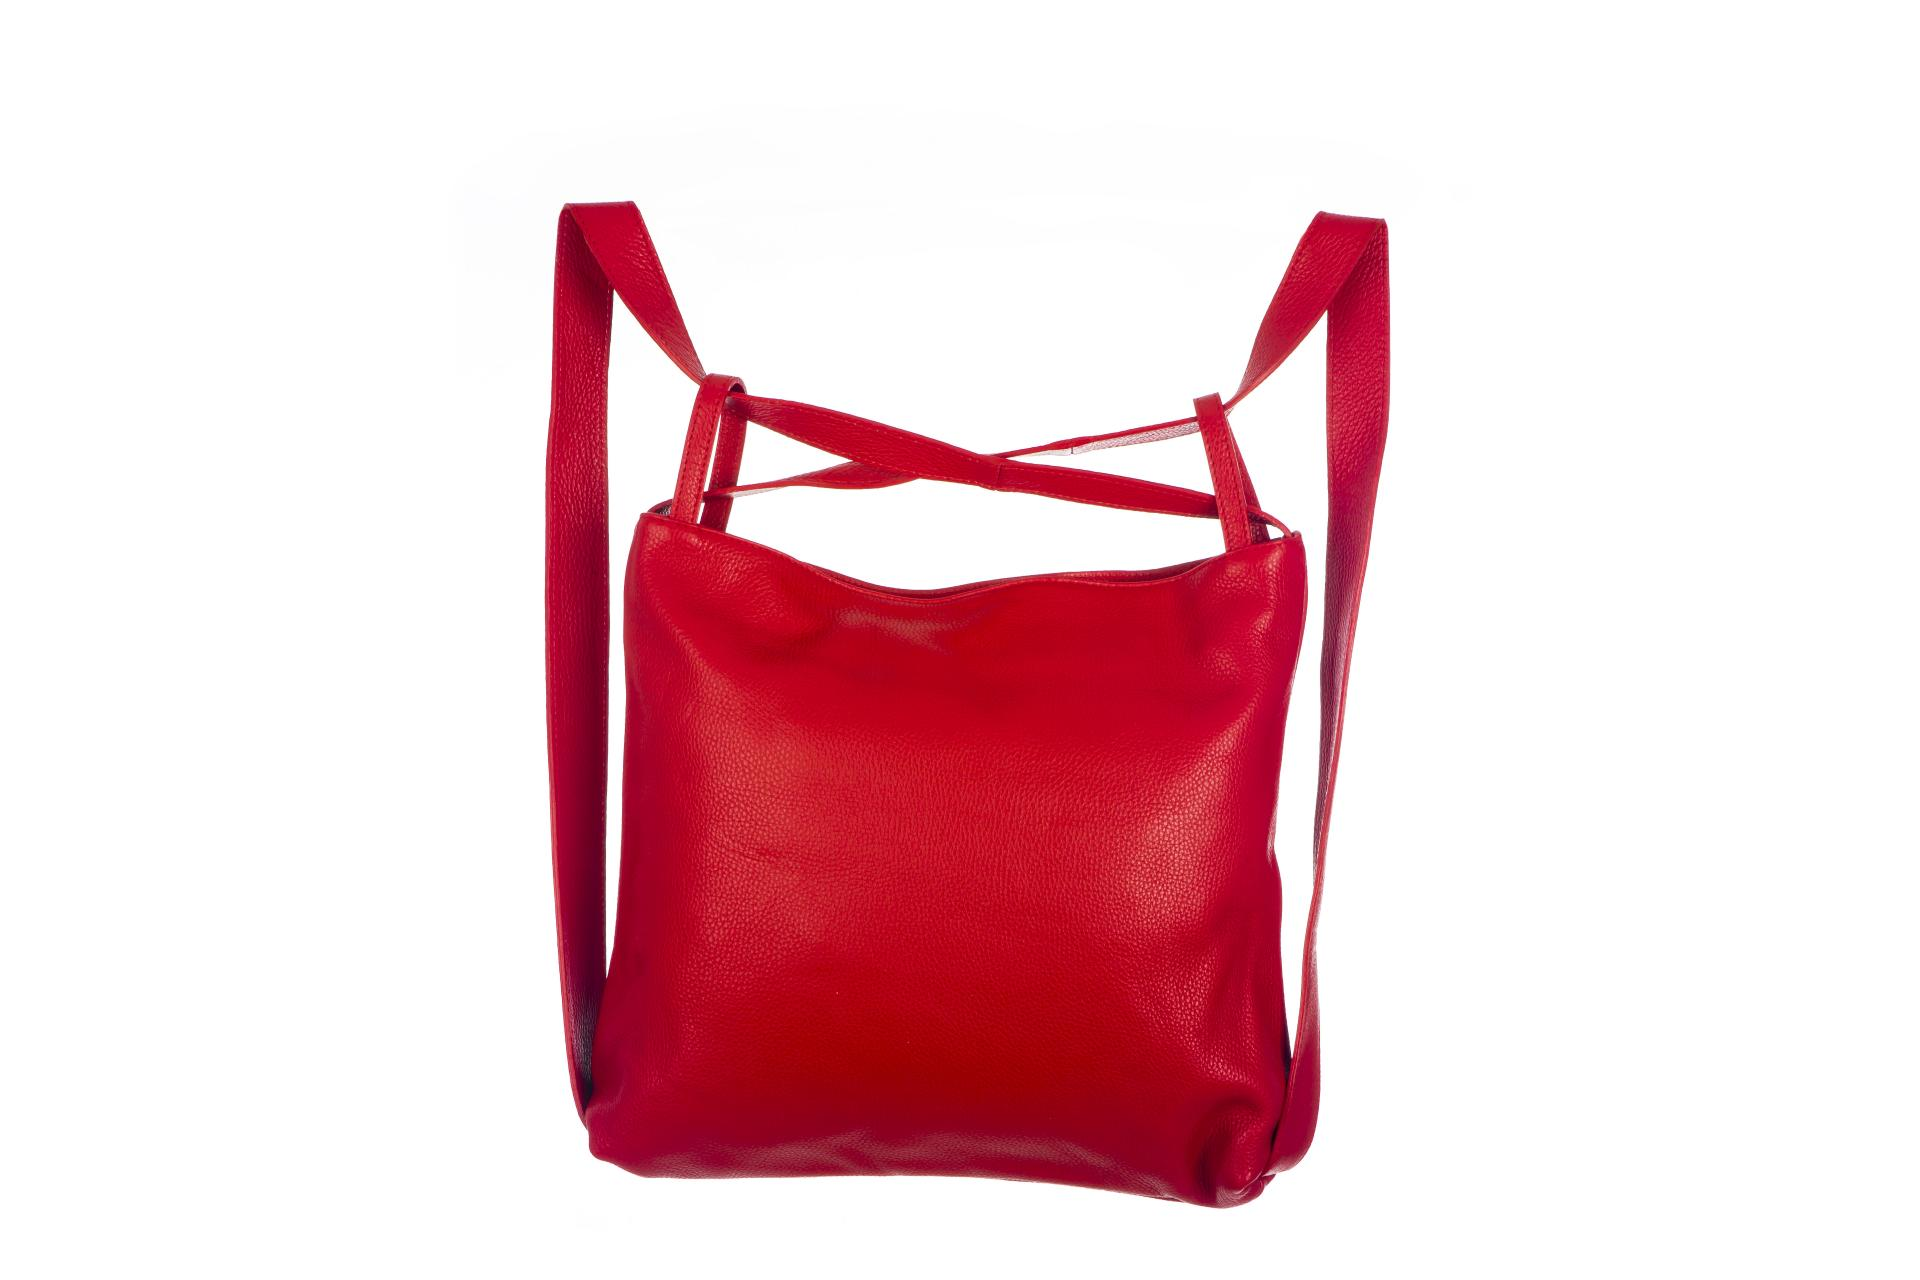 mochila saco roja 733.jpg